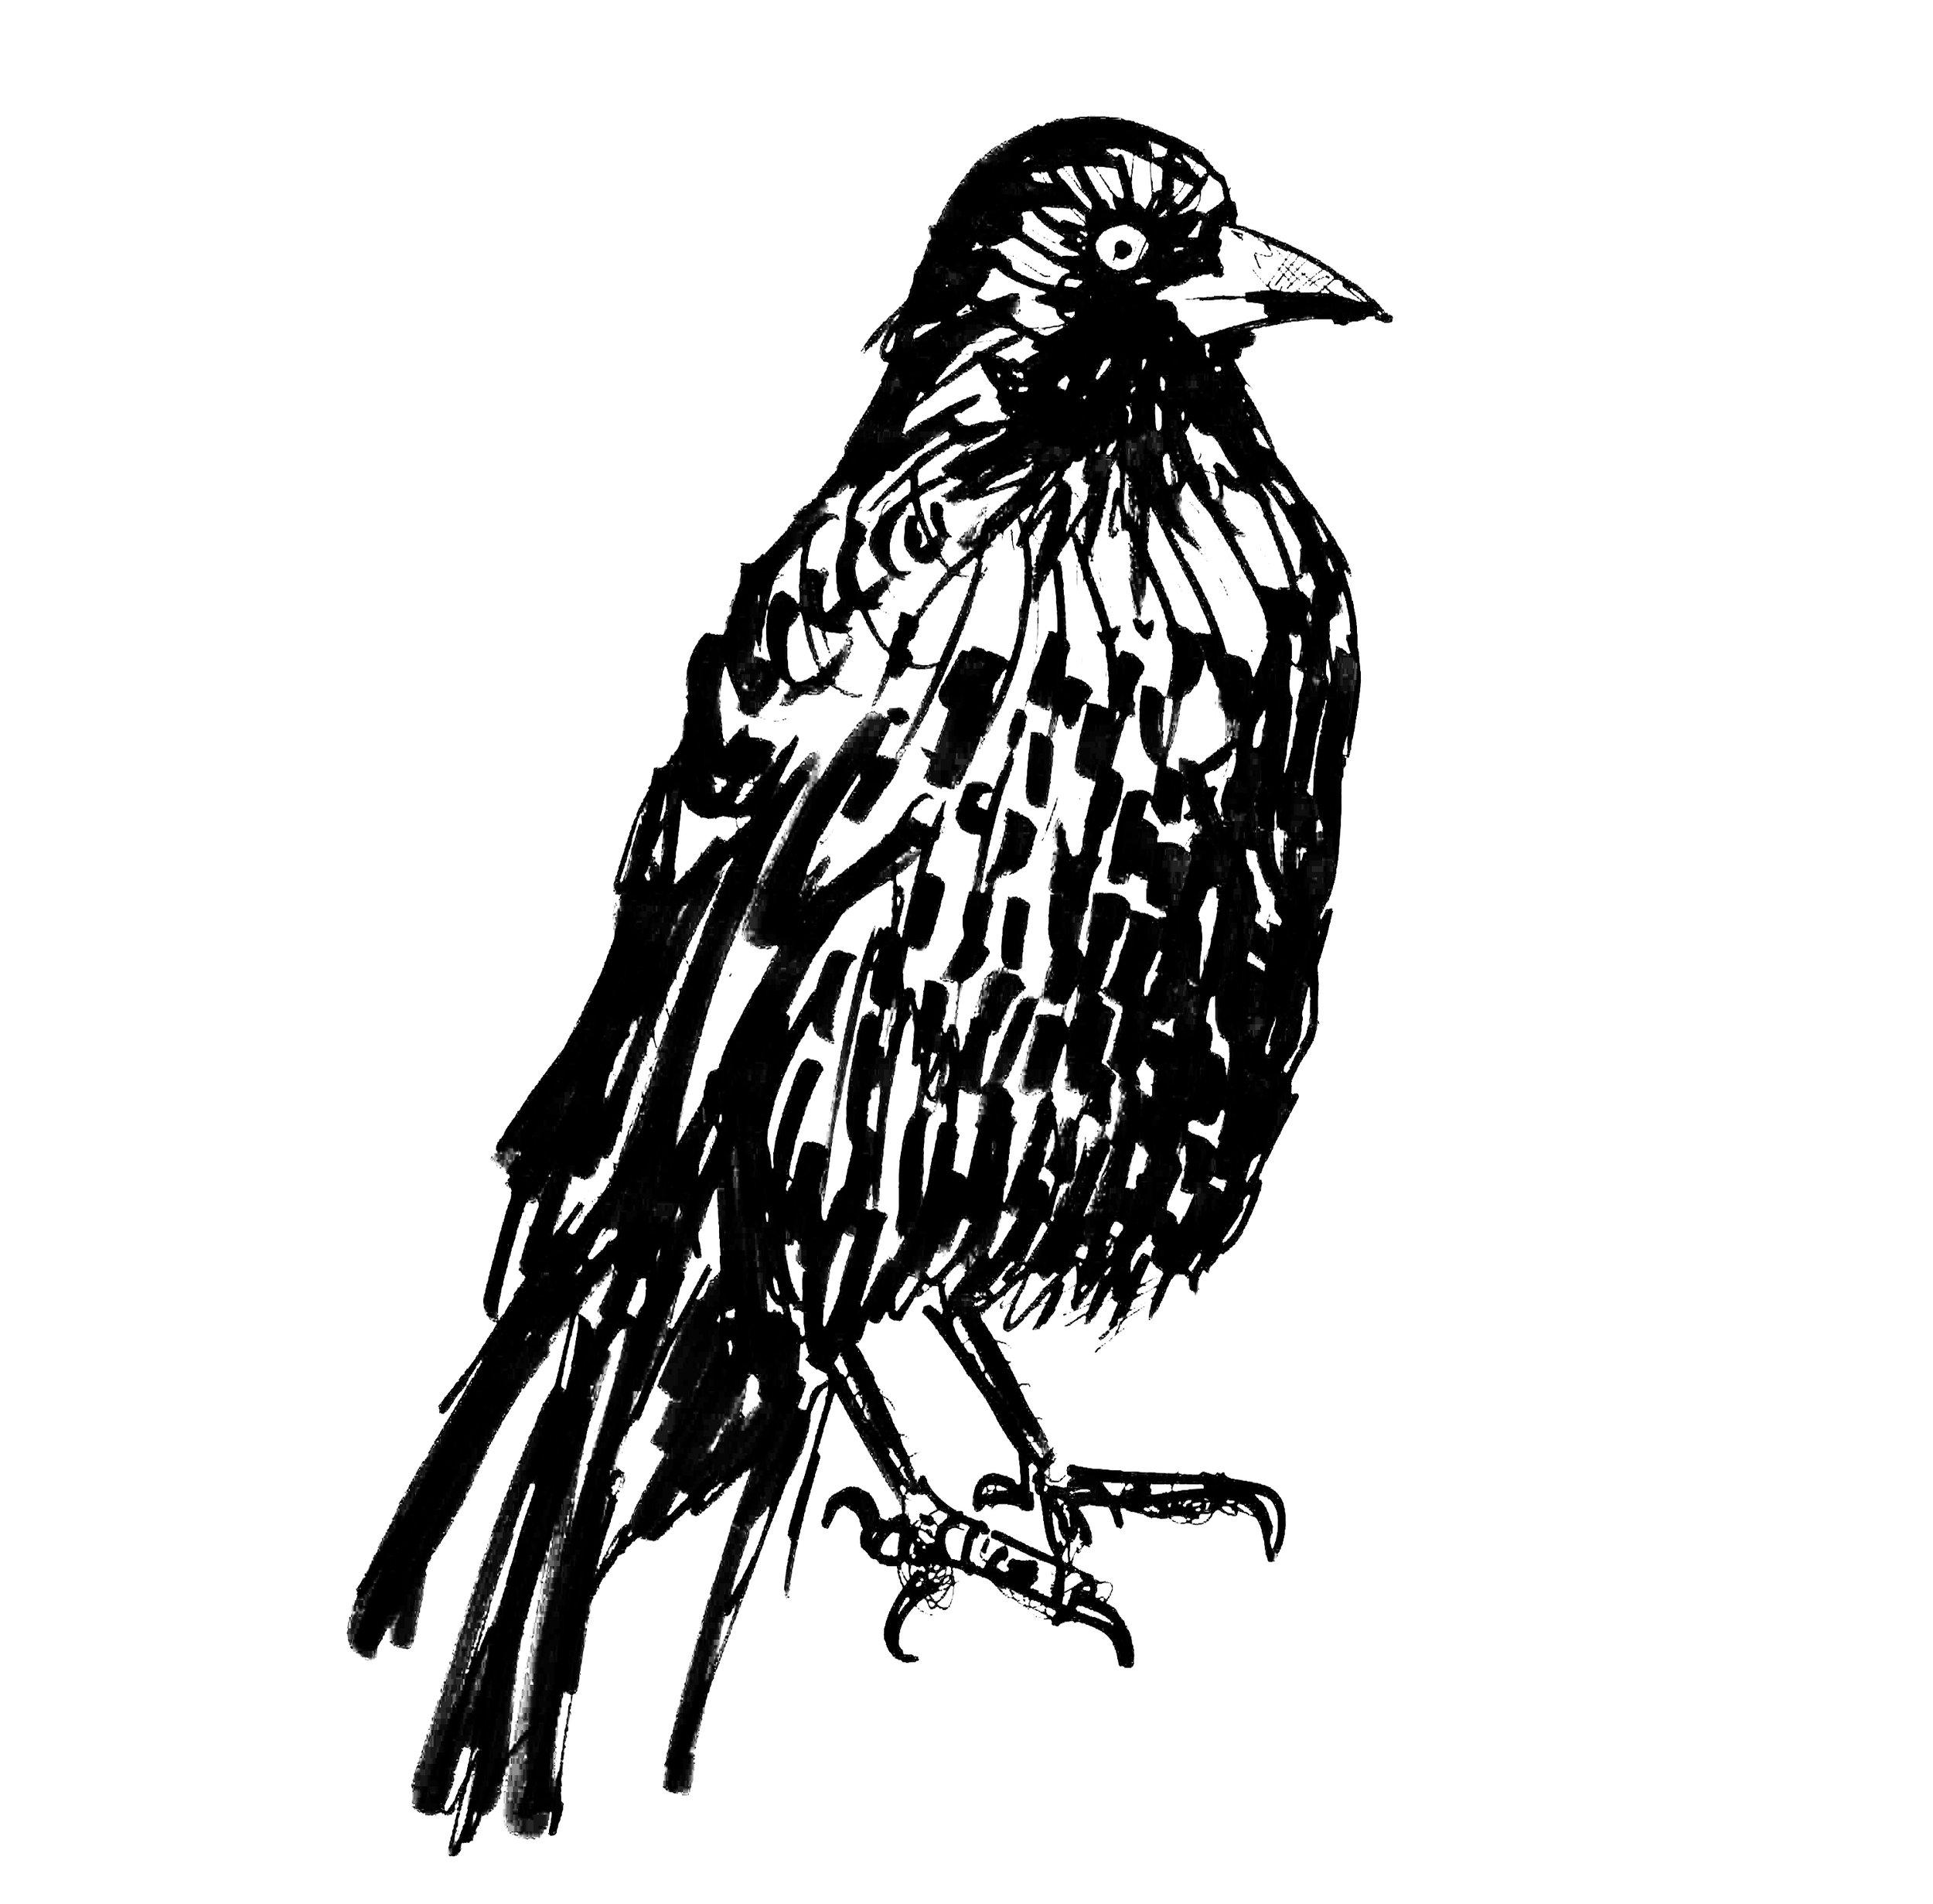 crowsquare.jpg